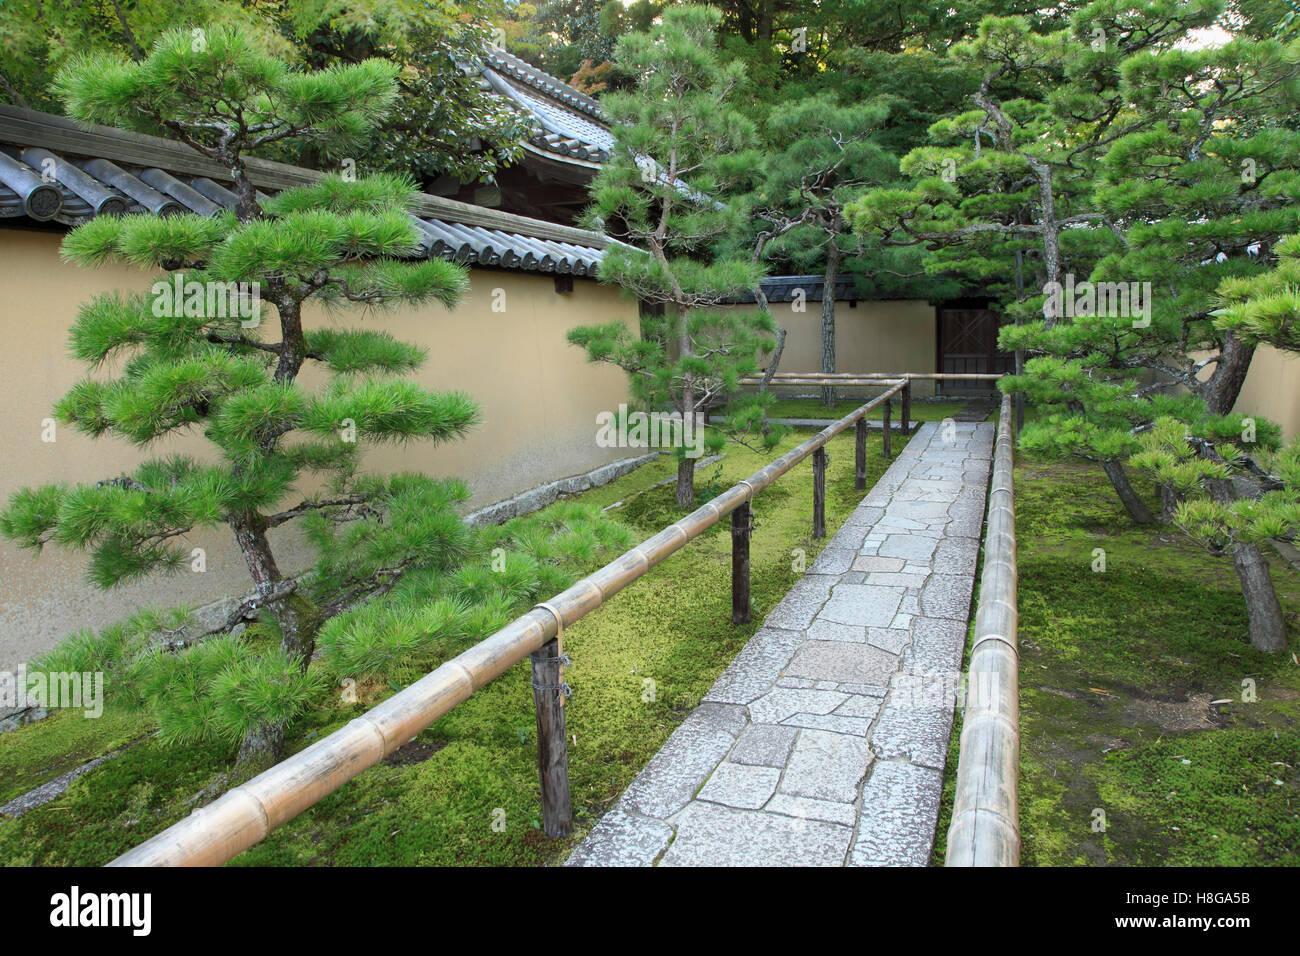 Japan, Kyoto, Daitoku-ji, Koto-in, garden, , path, - Stock Image